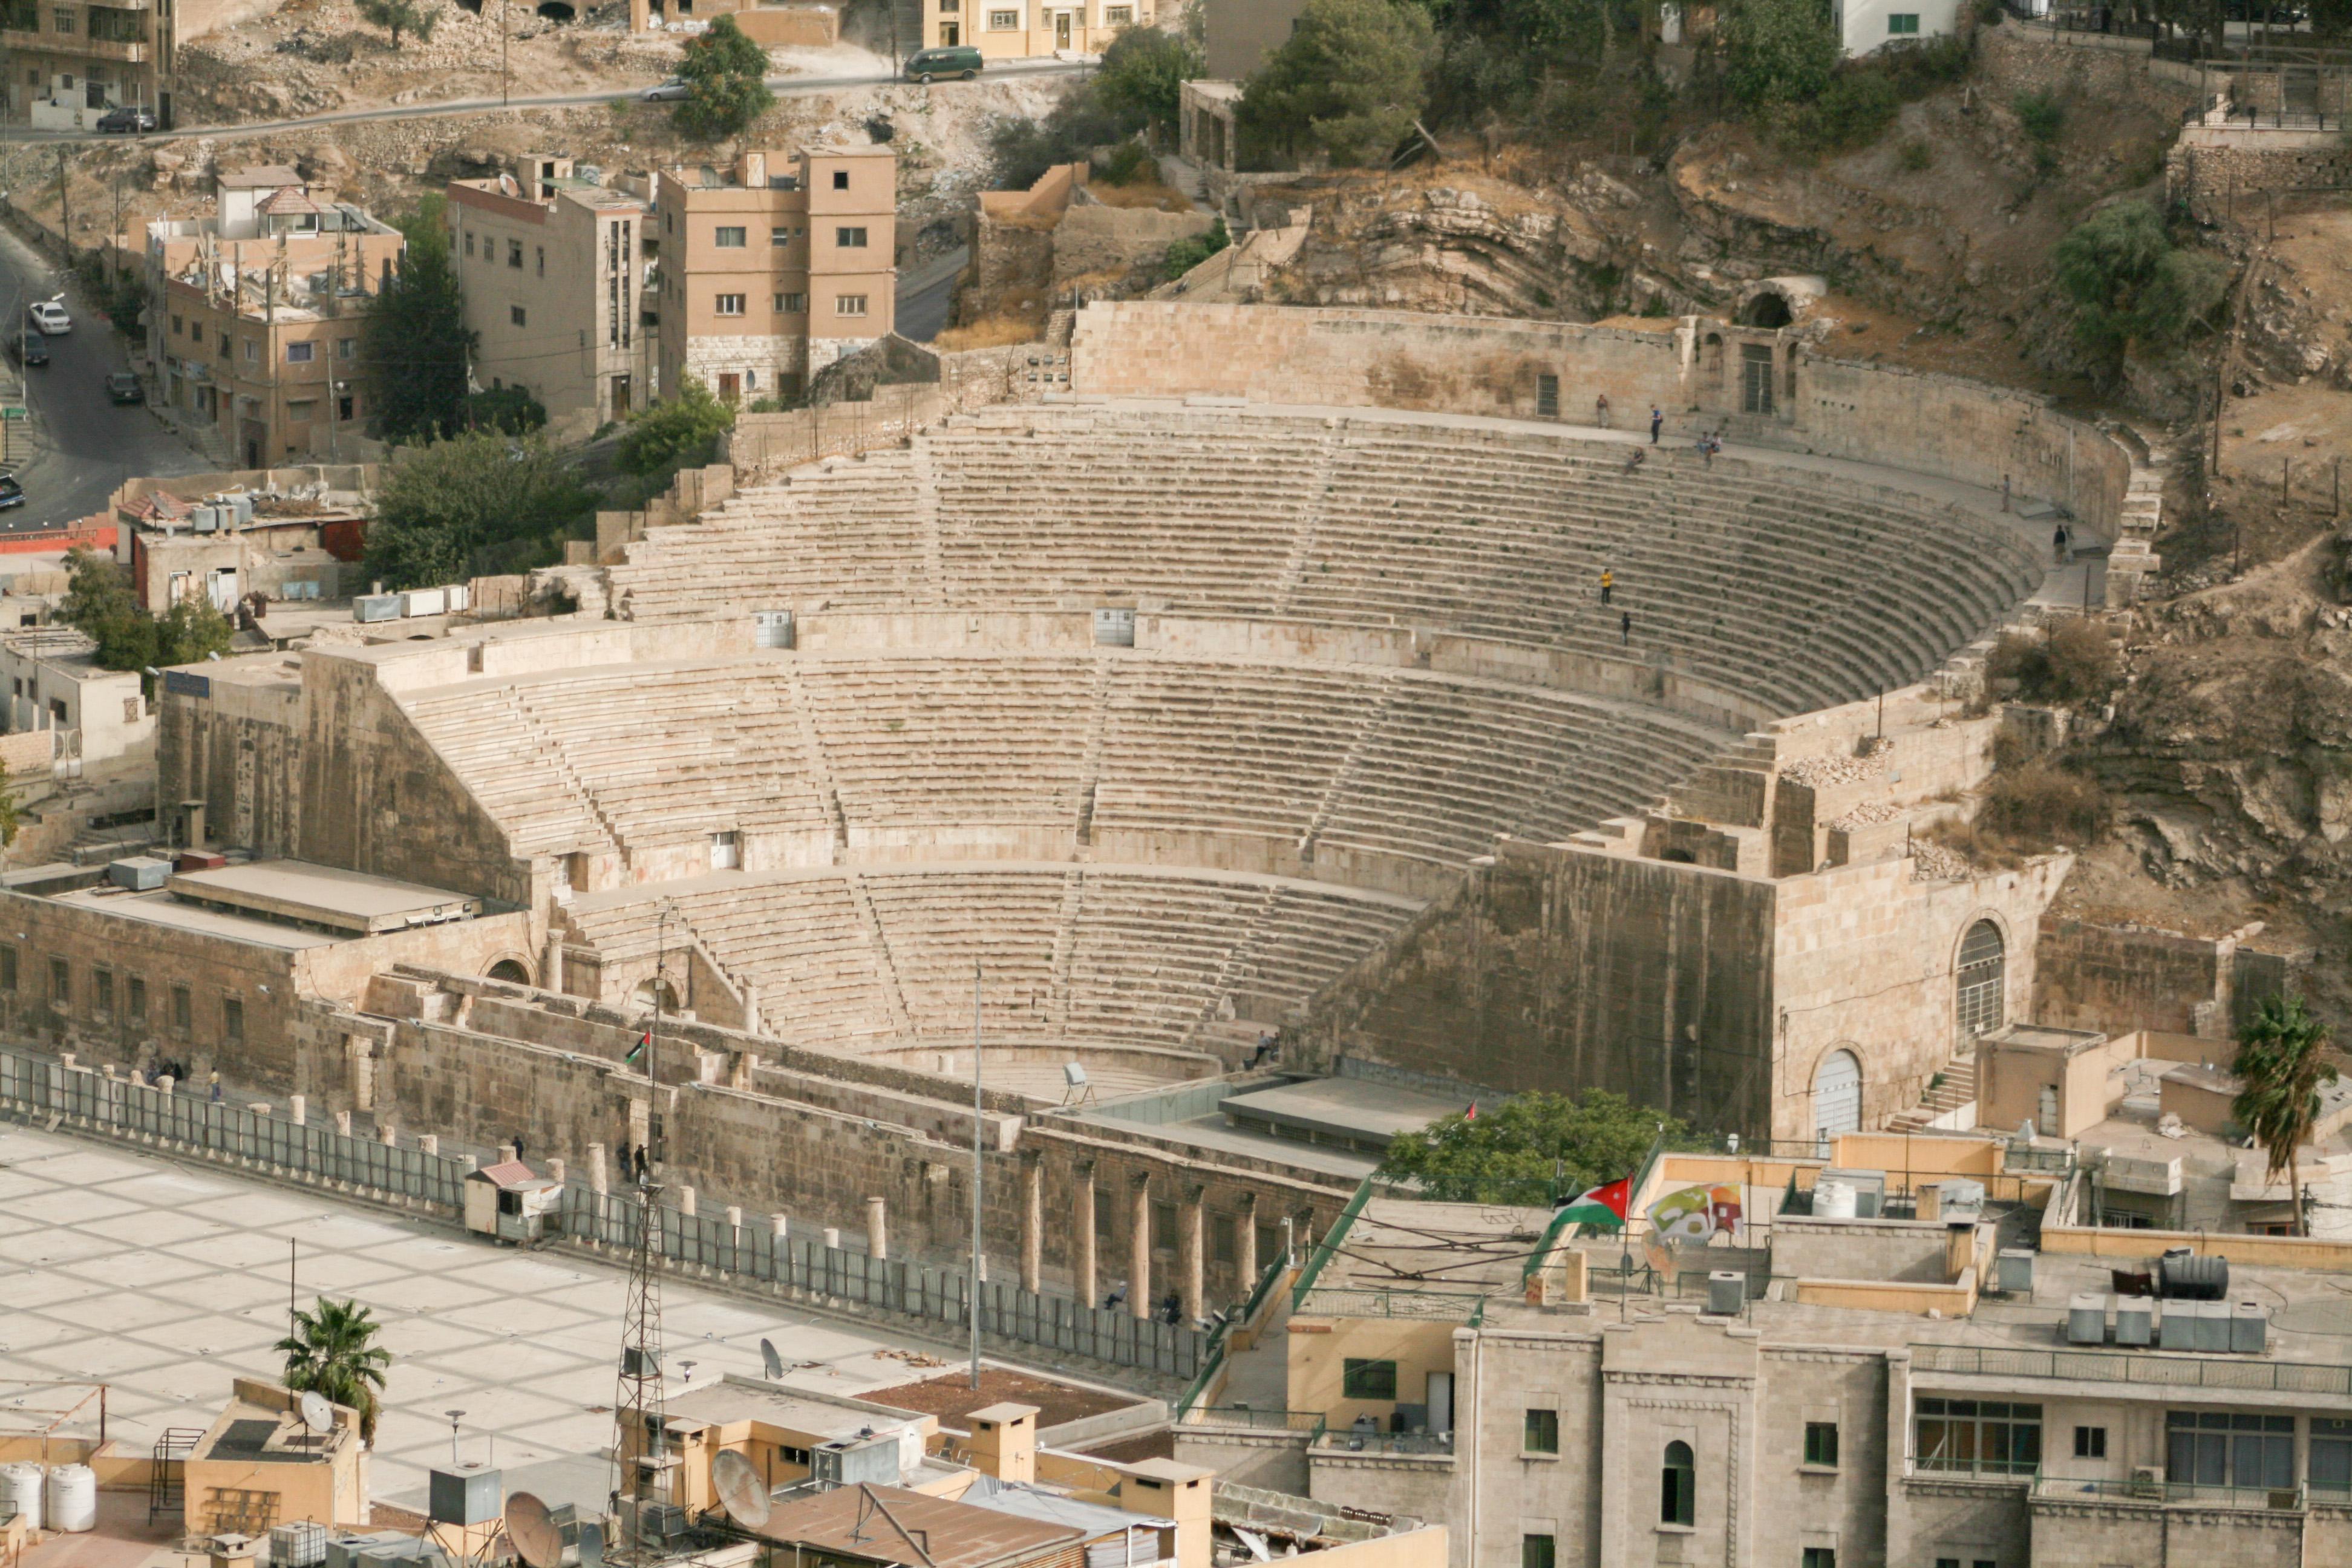 File:Roman theater in Amman, Jordan1.jpg - Wikimedia Commons